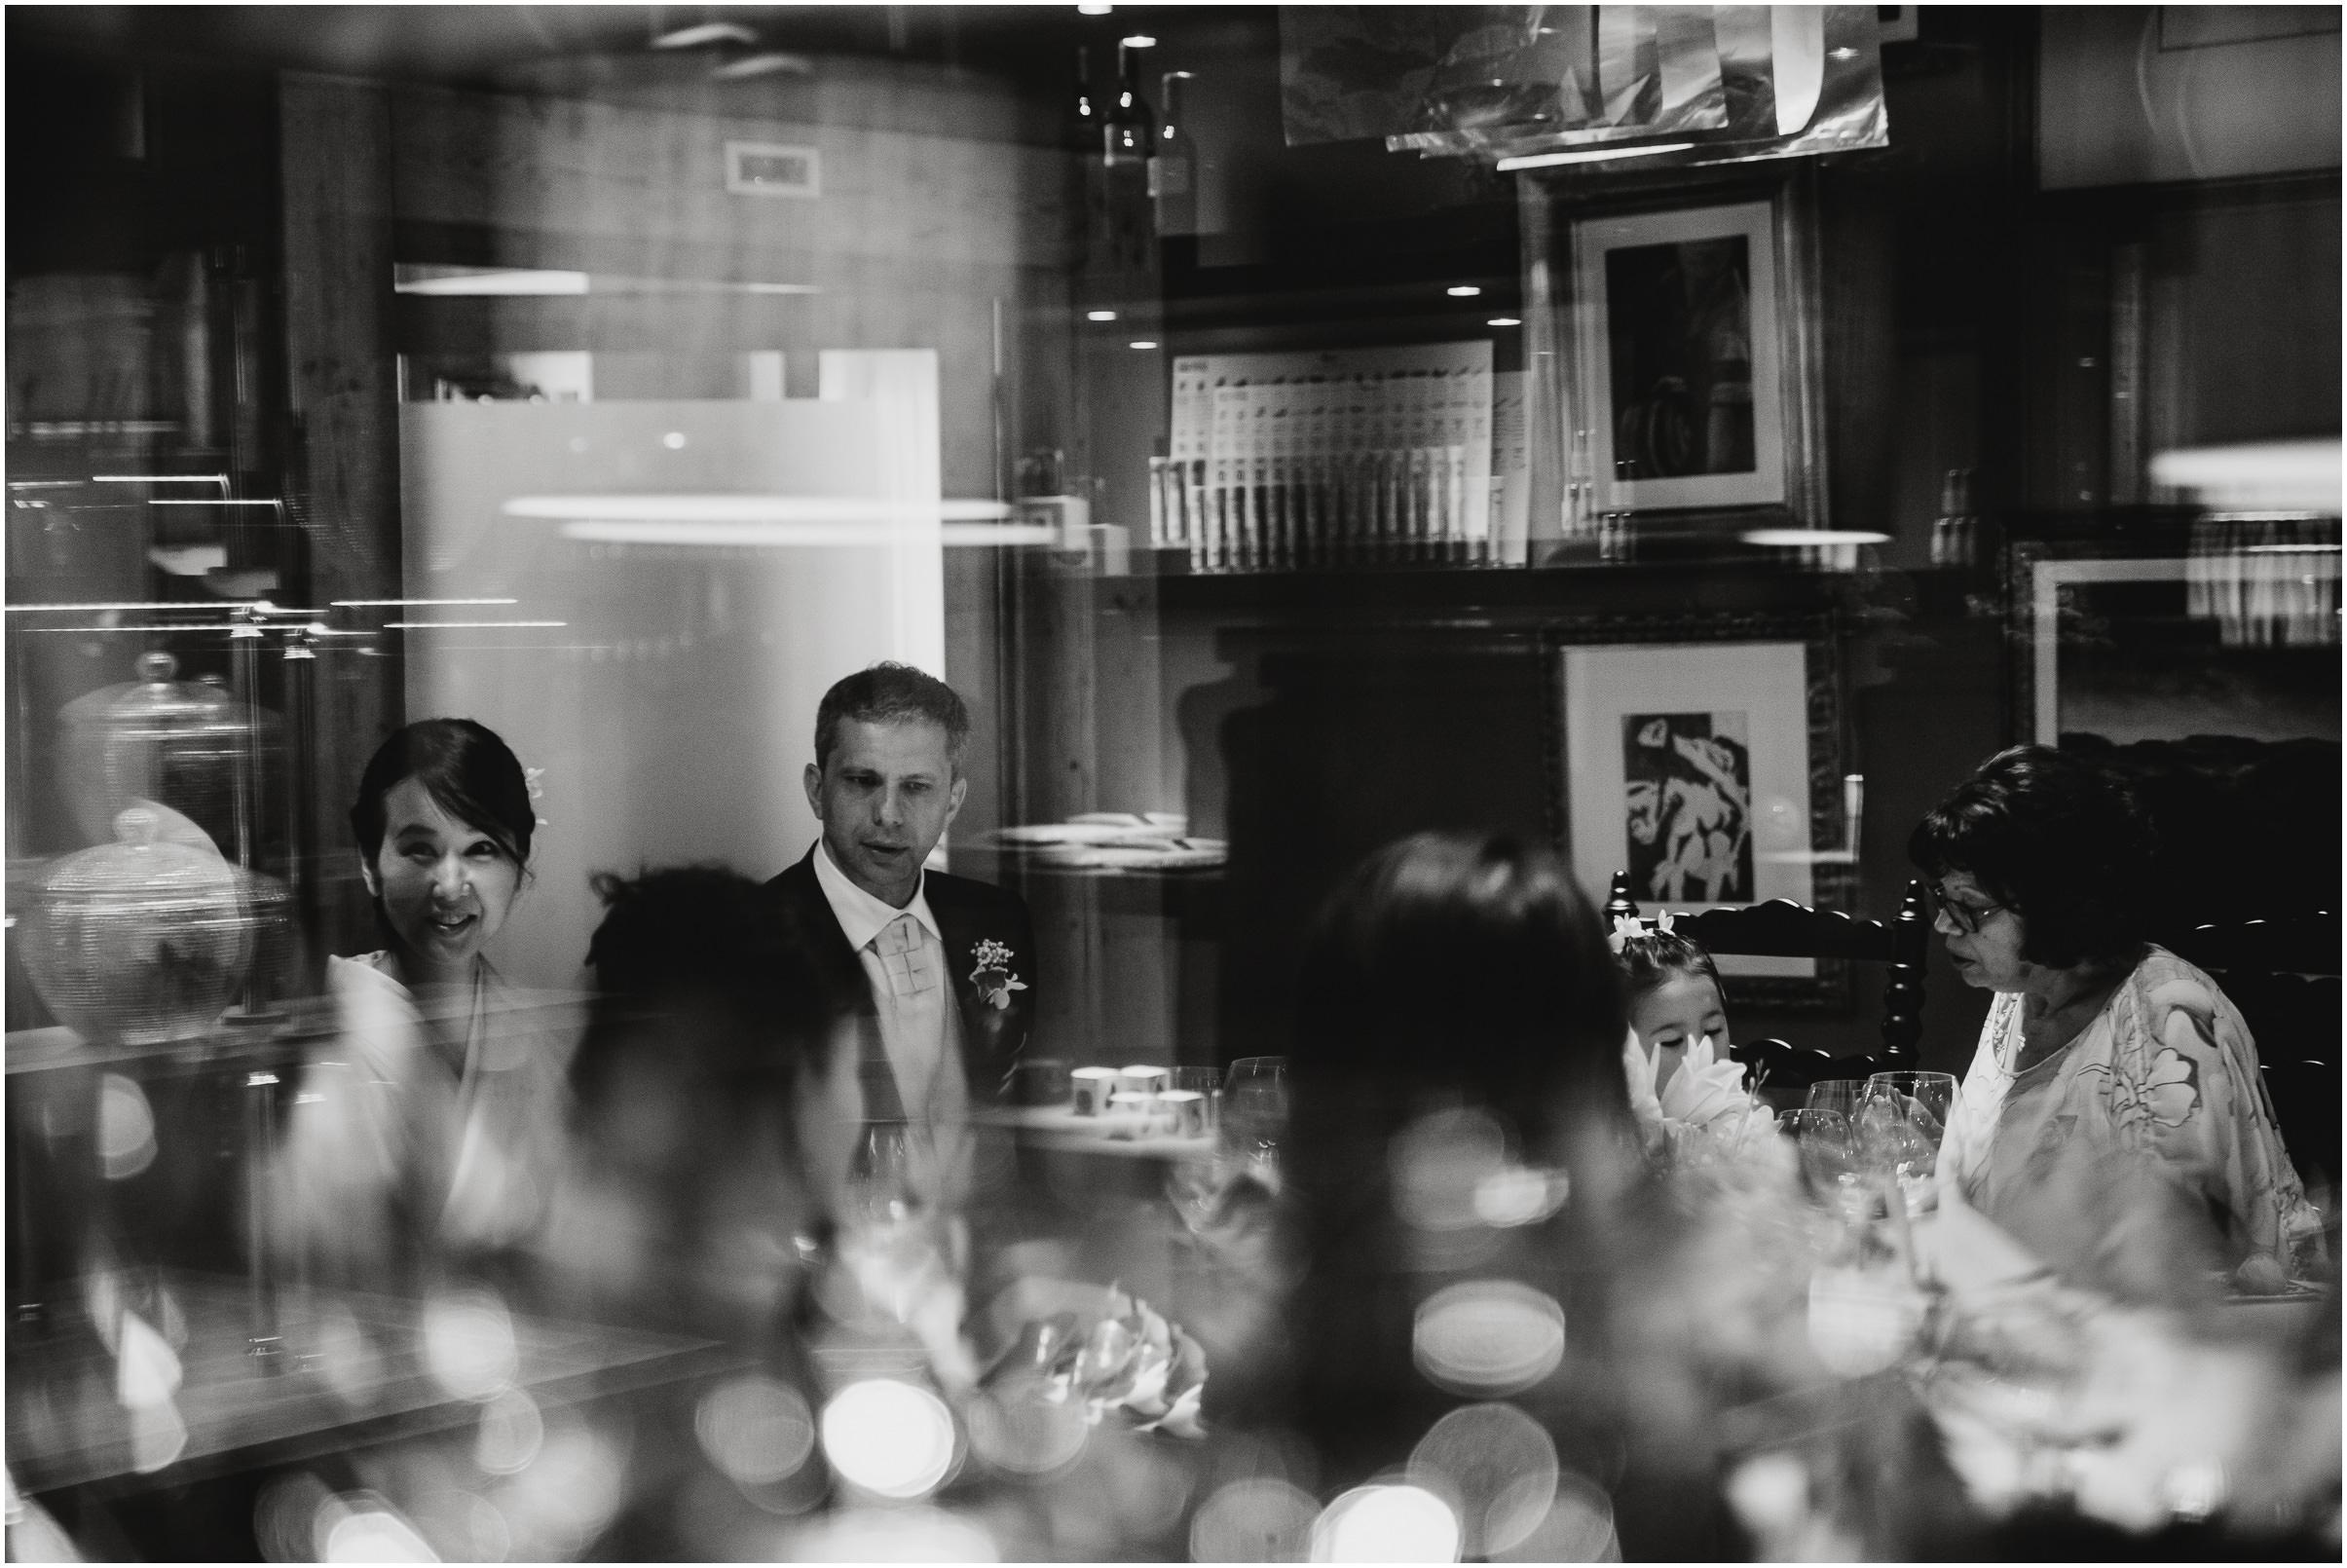 WEDDING-PHOTOGRAPHY-SARA-LORENZONI-FOTOGRAFIA-MATRIMONIO-ORVIETO-JUKA-ANTONELLO53